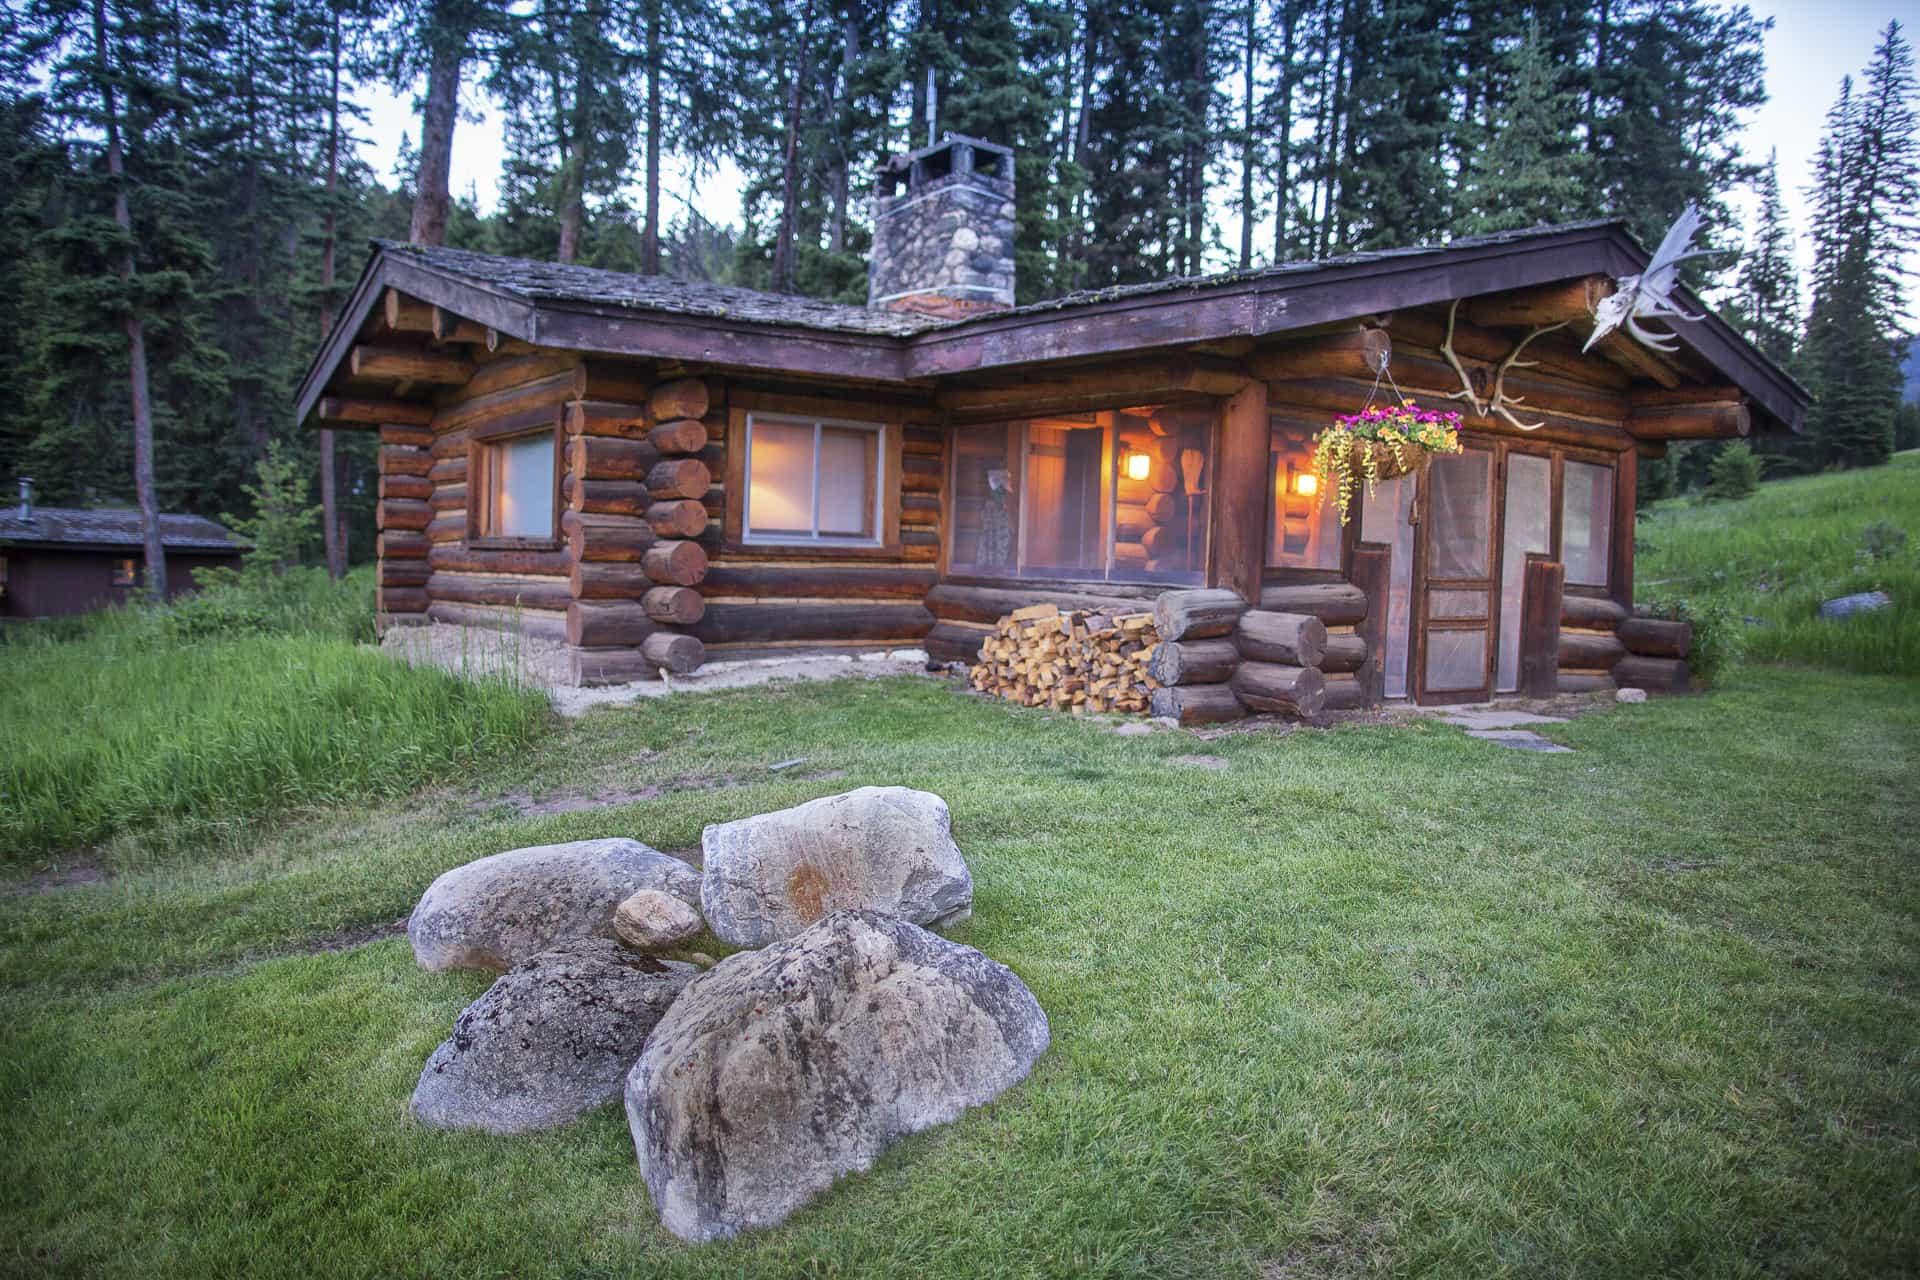 Lone mountain ranch, big sky, madison county, montana, united states of americadestination. Tia Metzger Author At Lone Mountain Ranchlone Mountain Ranch